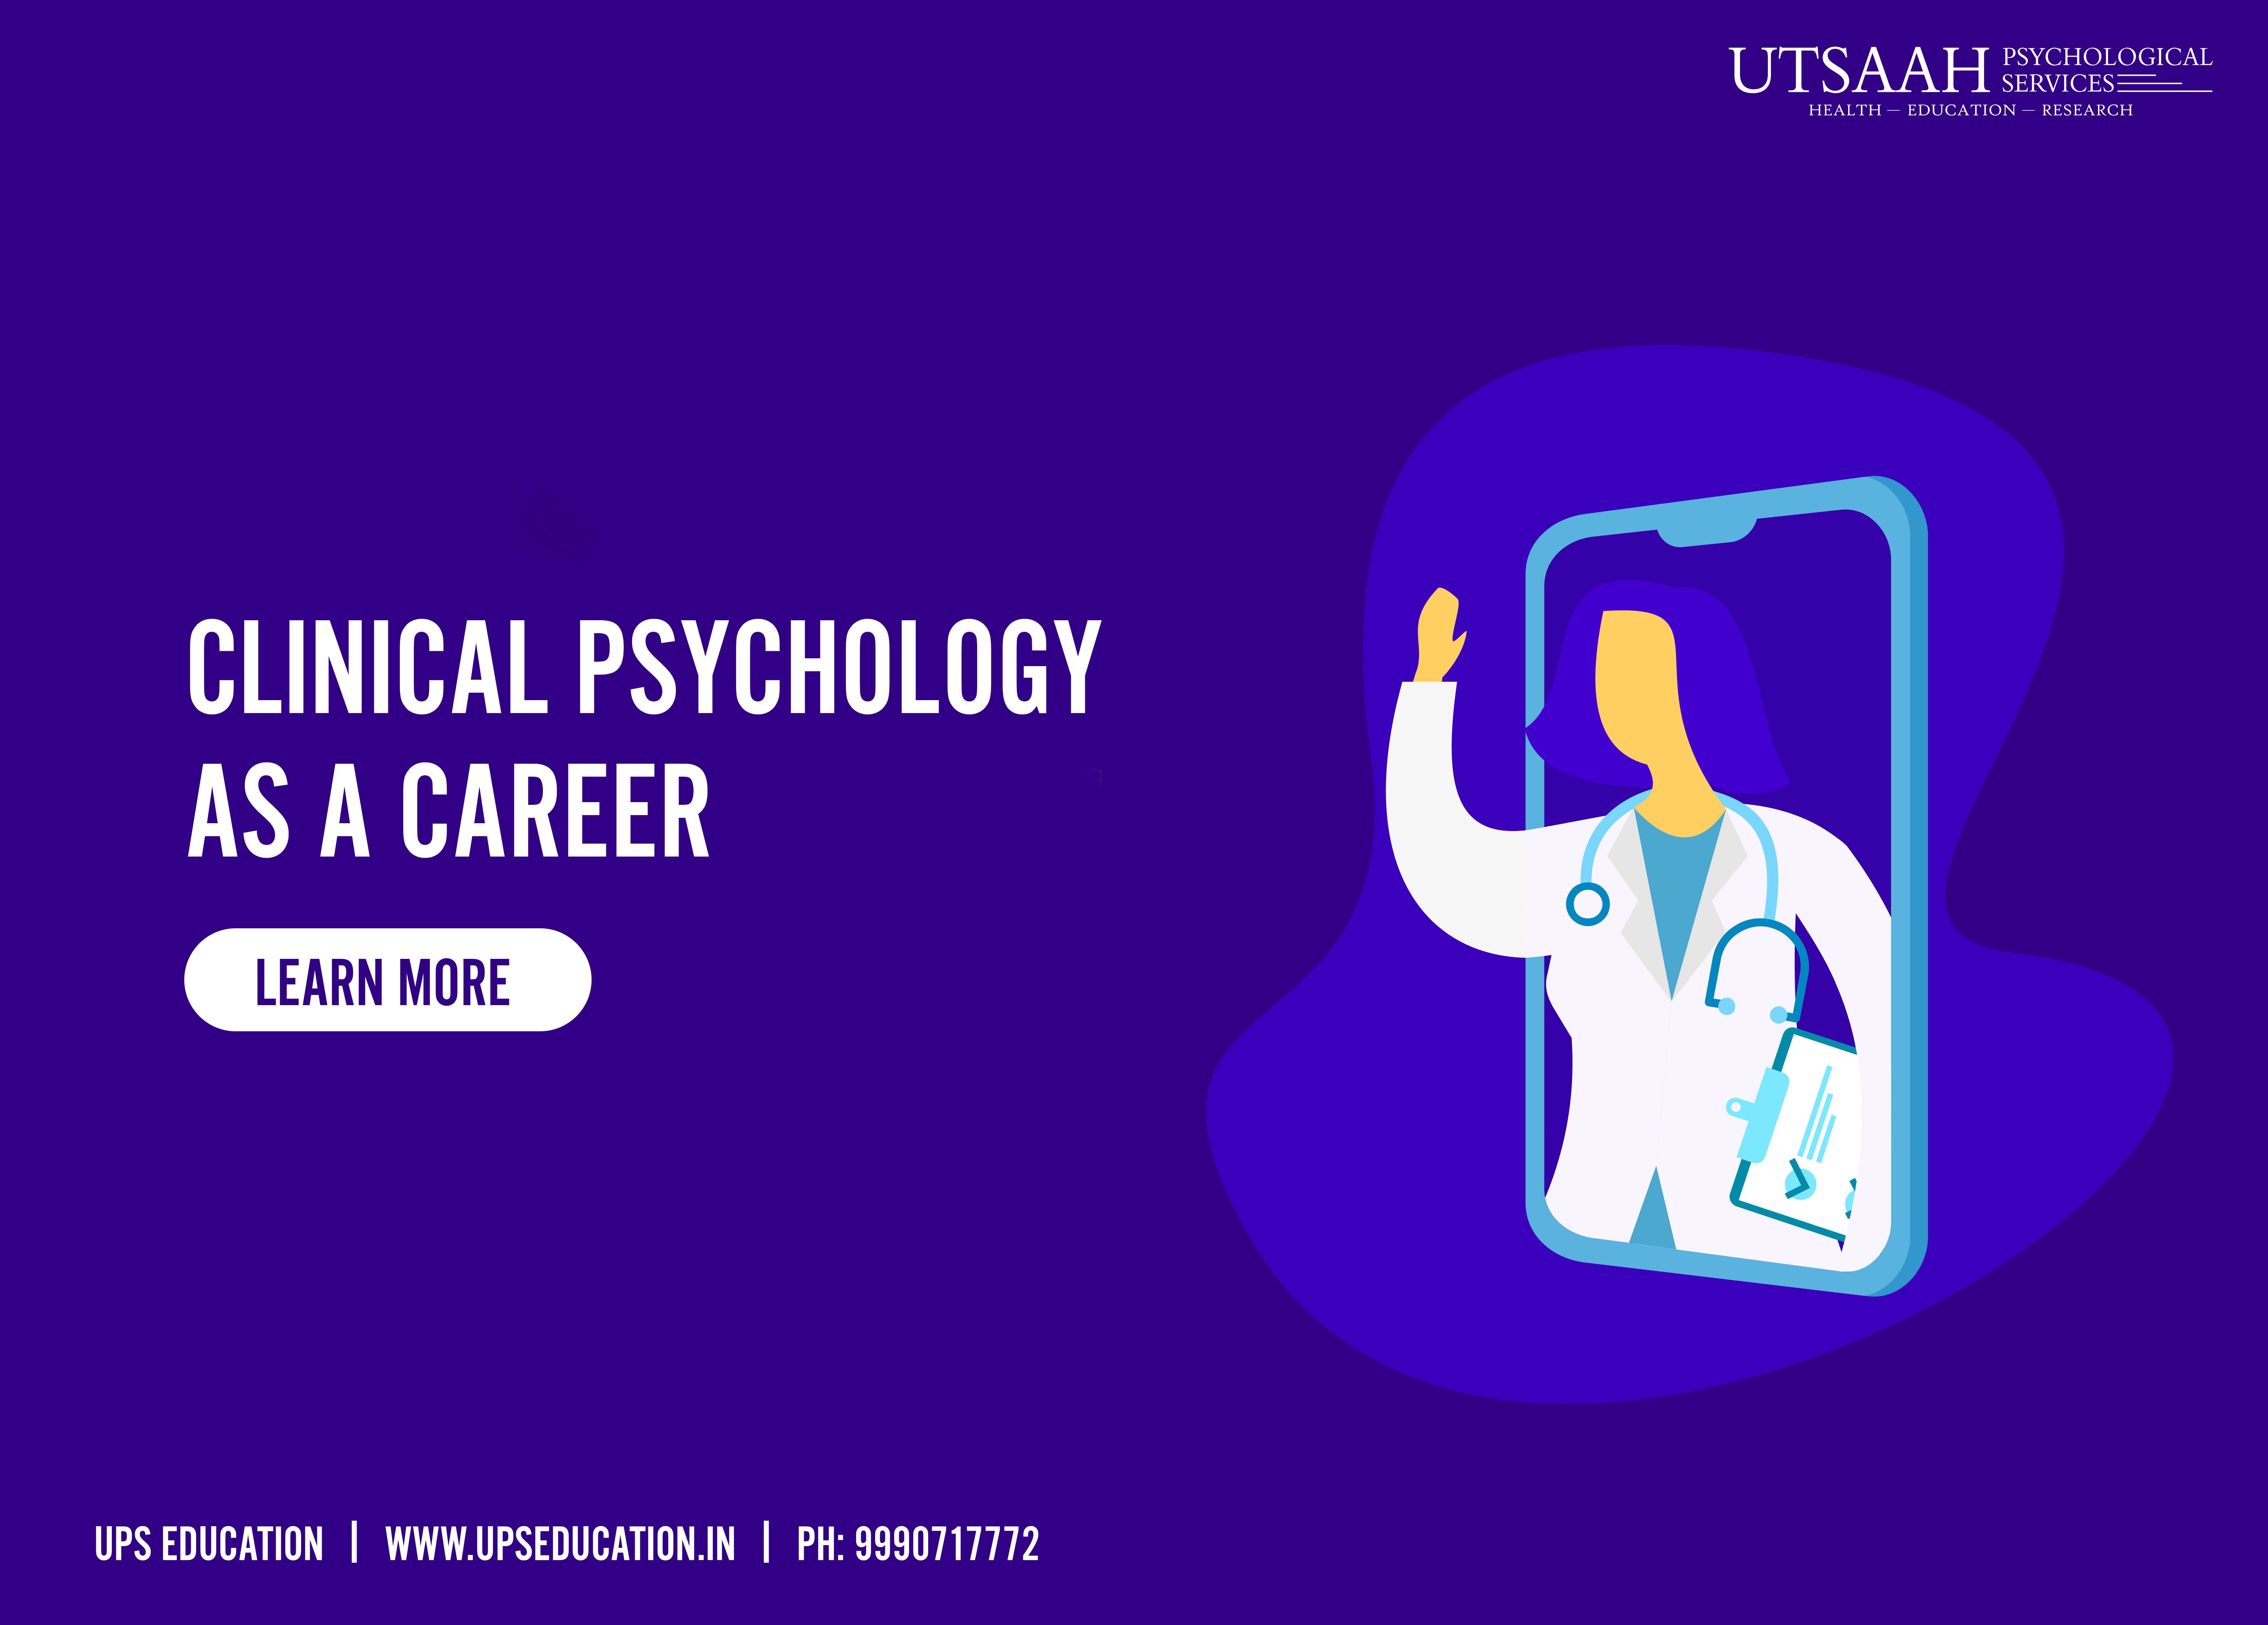 Clinical Psychology as career